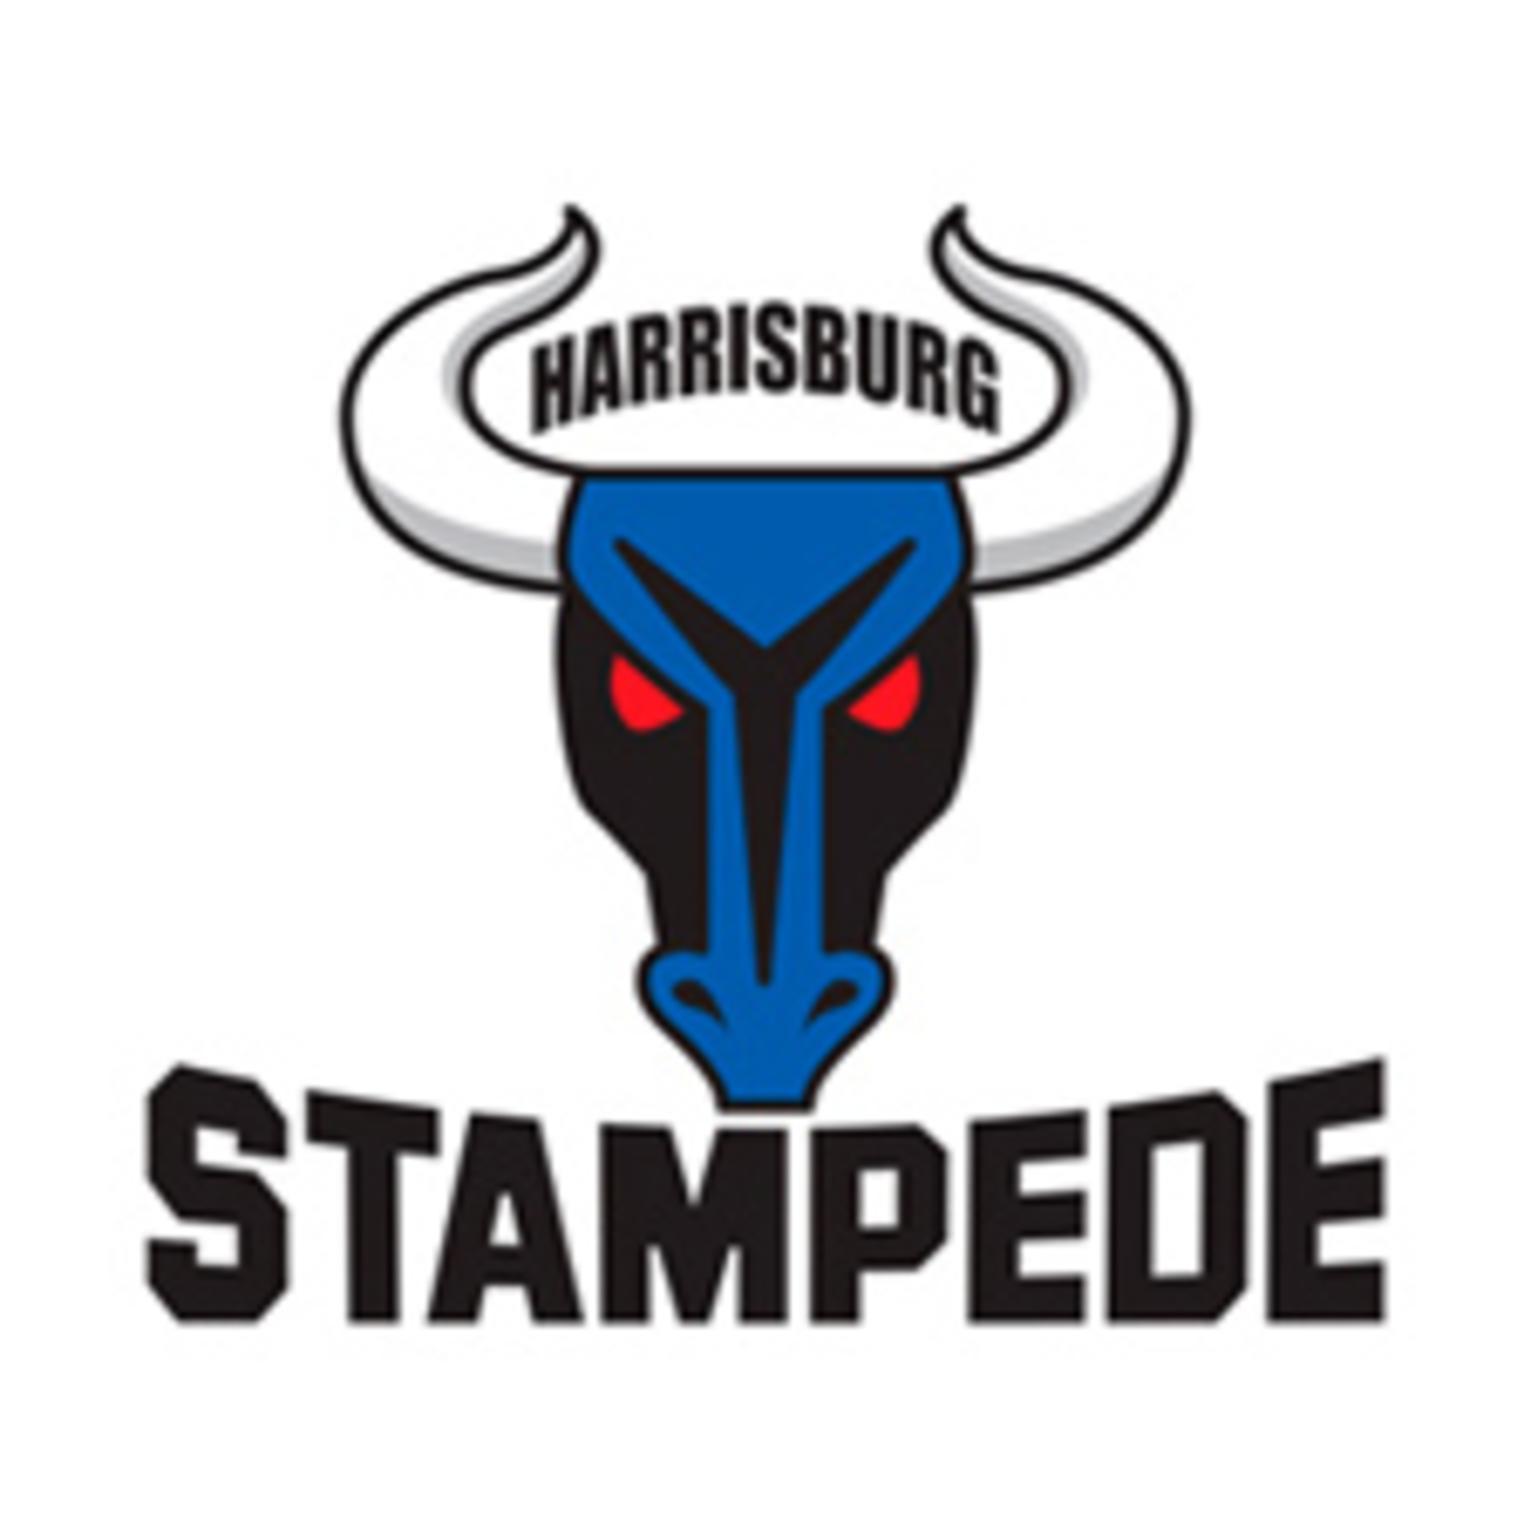 Harrisburg Stampede